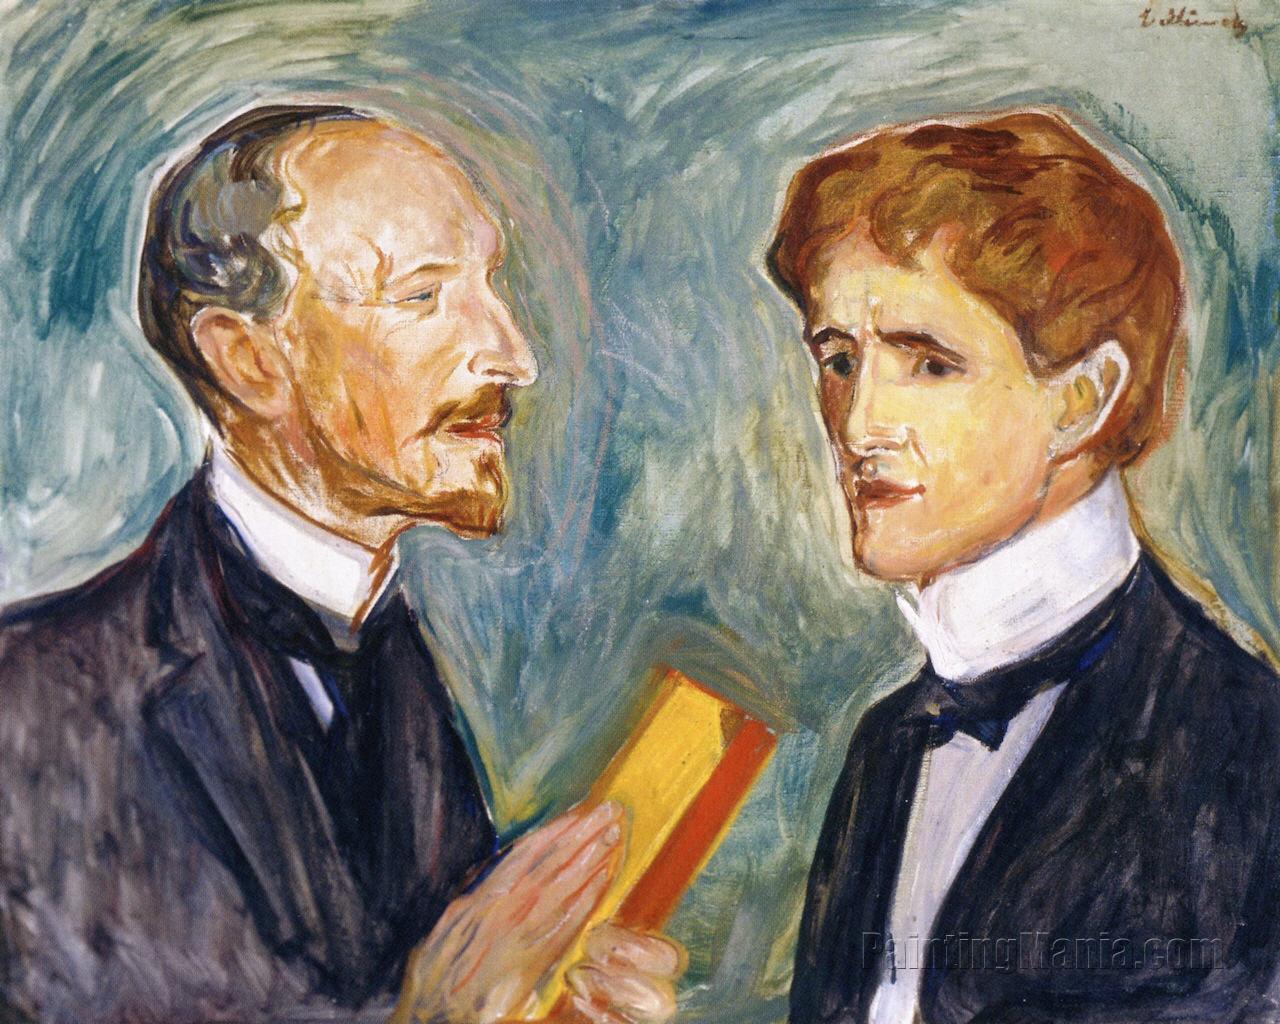 Albert Kollmann and Sten Drewsen